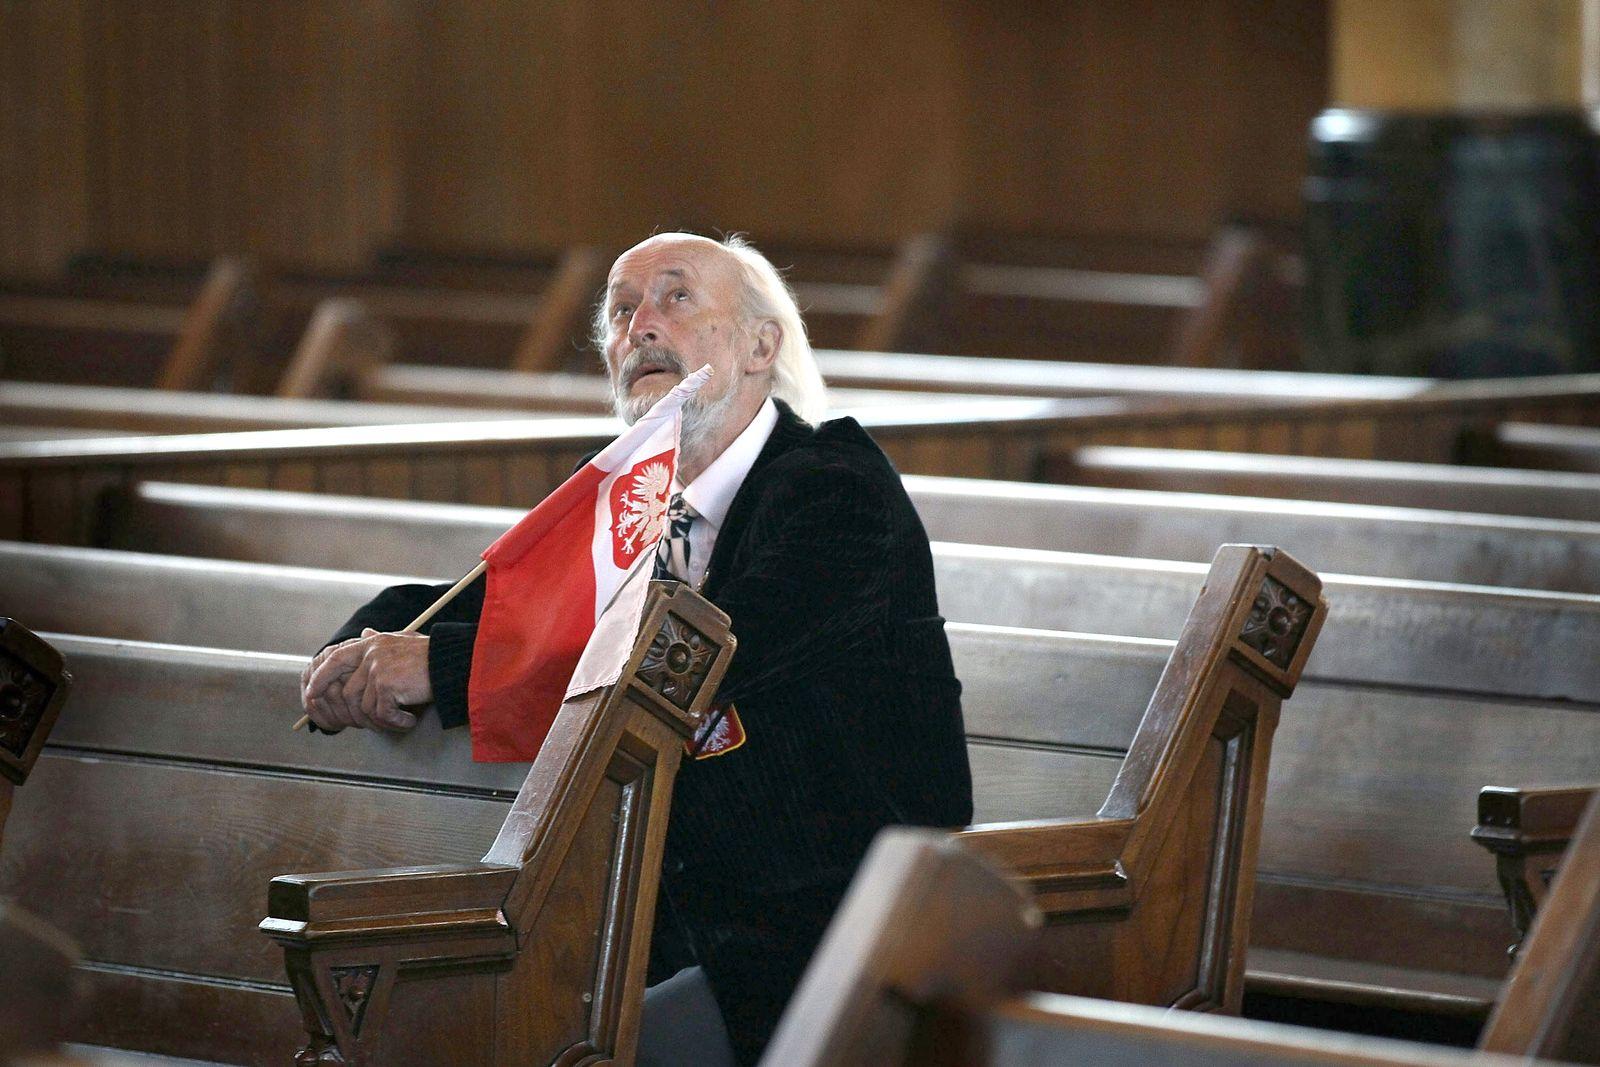 Polen/ Glaube/ Katholizismus